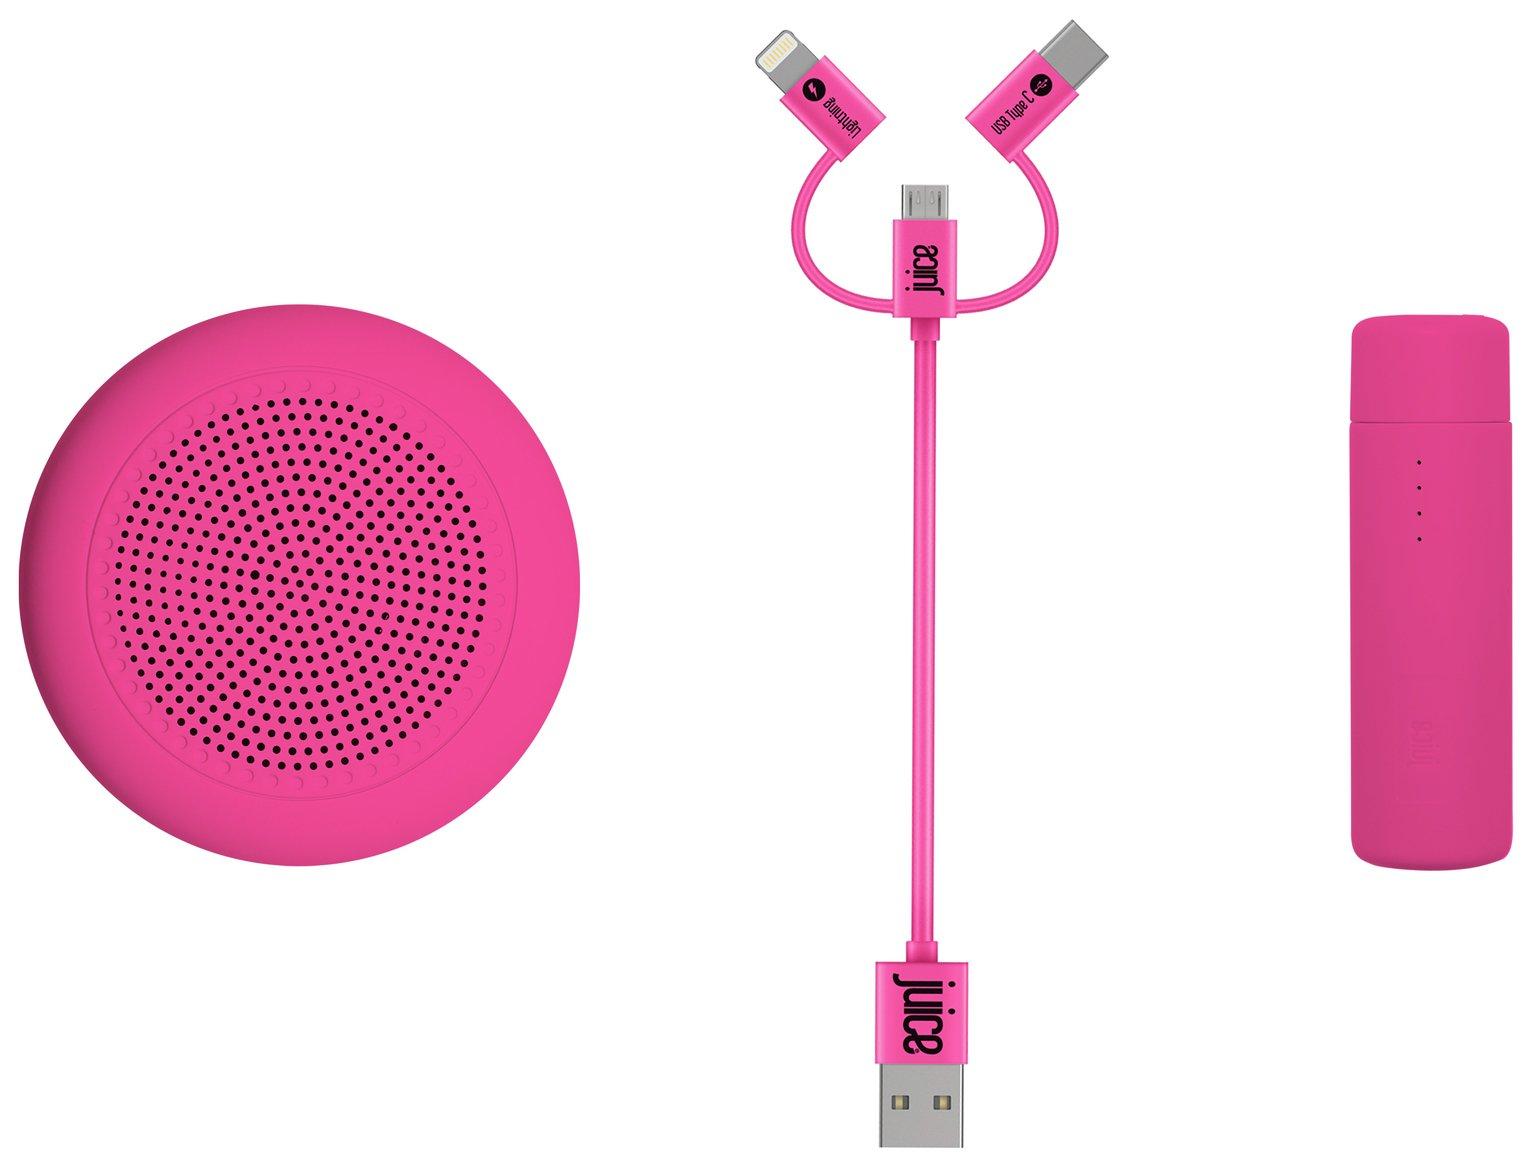 Juice Festival Essential Speaker and Power Bank - Pink